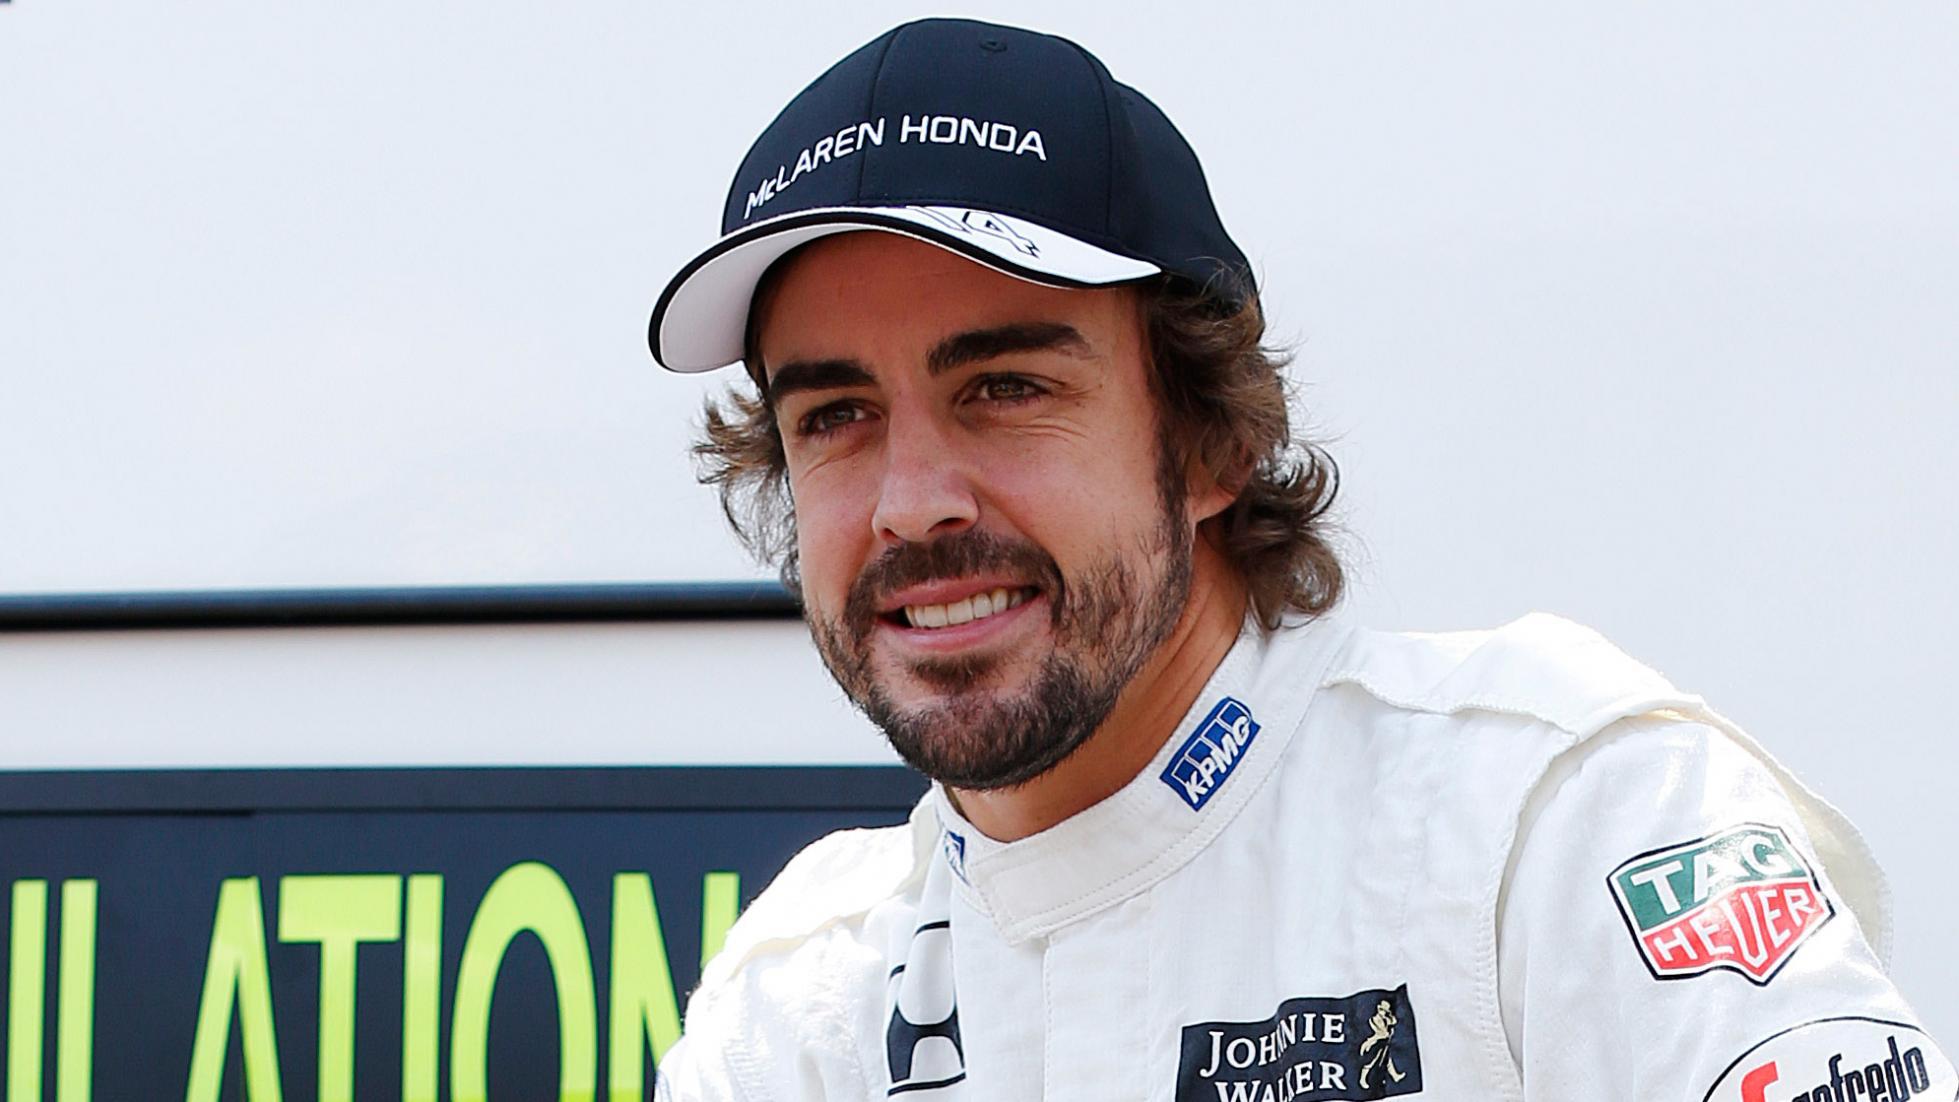 HQ Fernando Alonso Wallpapers | File 153.88Kb